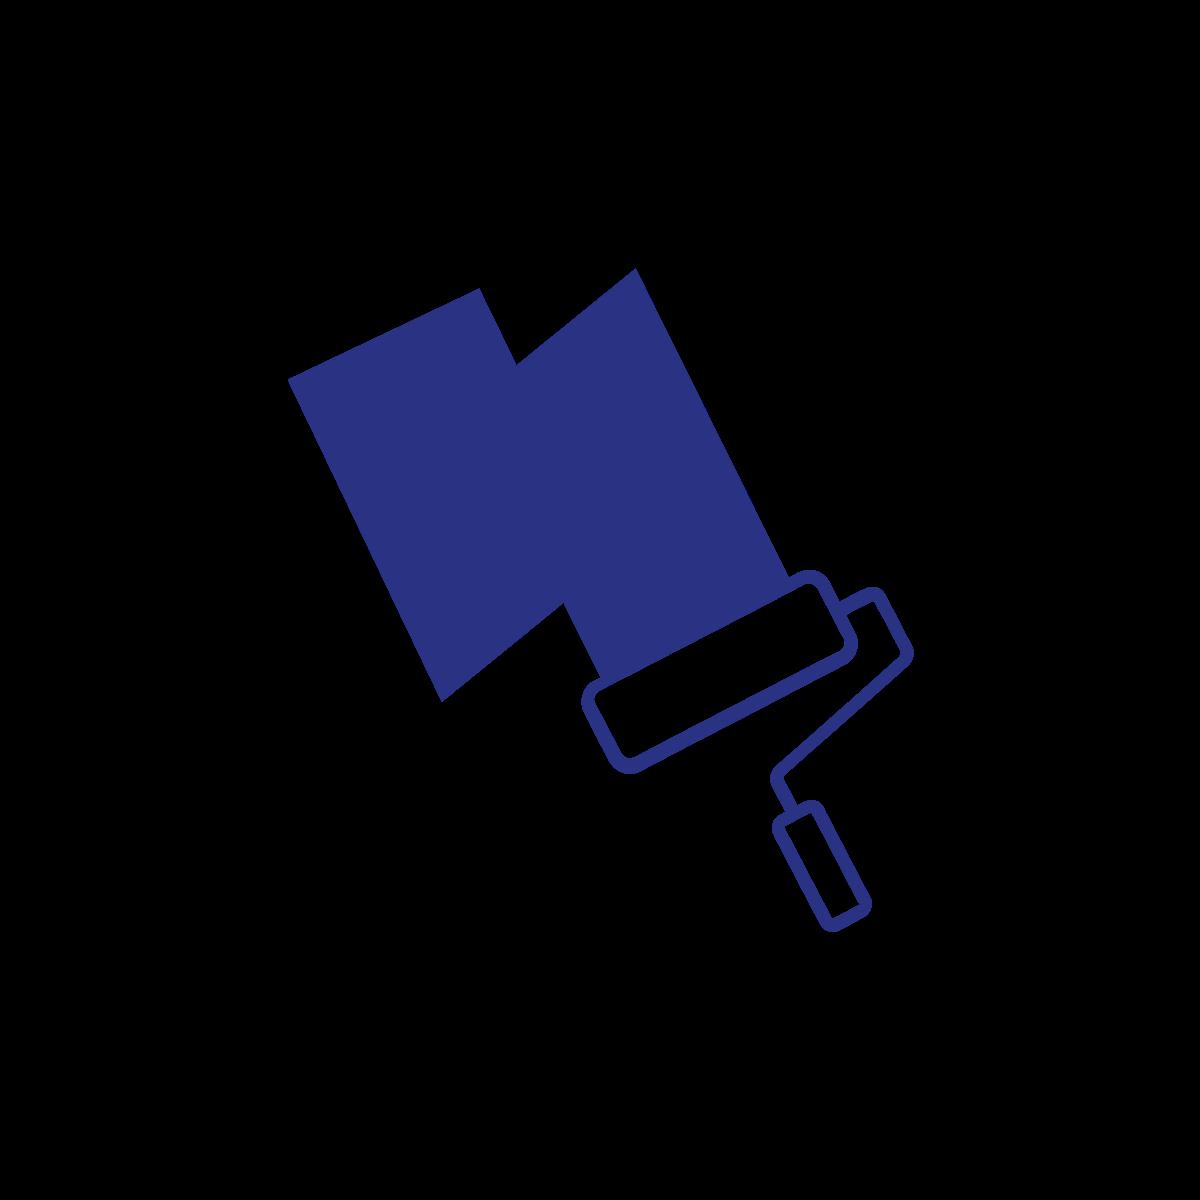 icon-priming